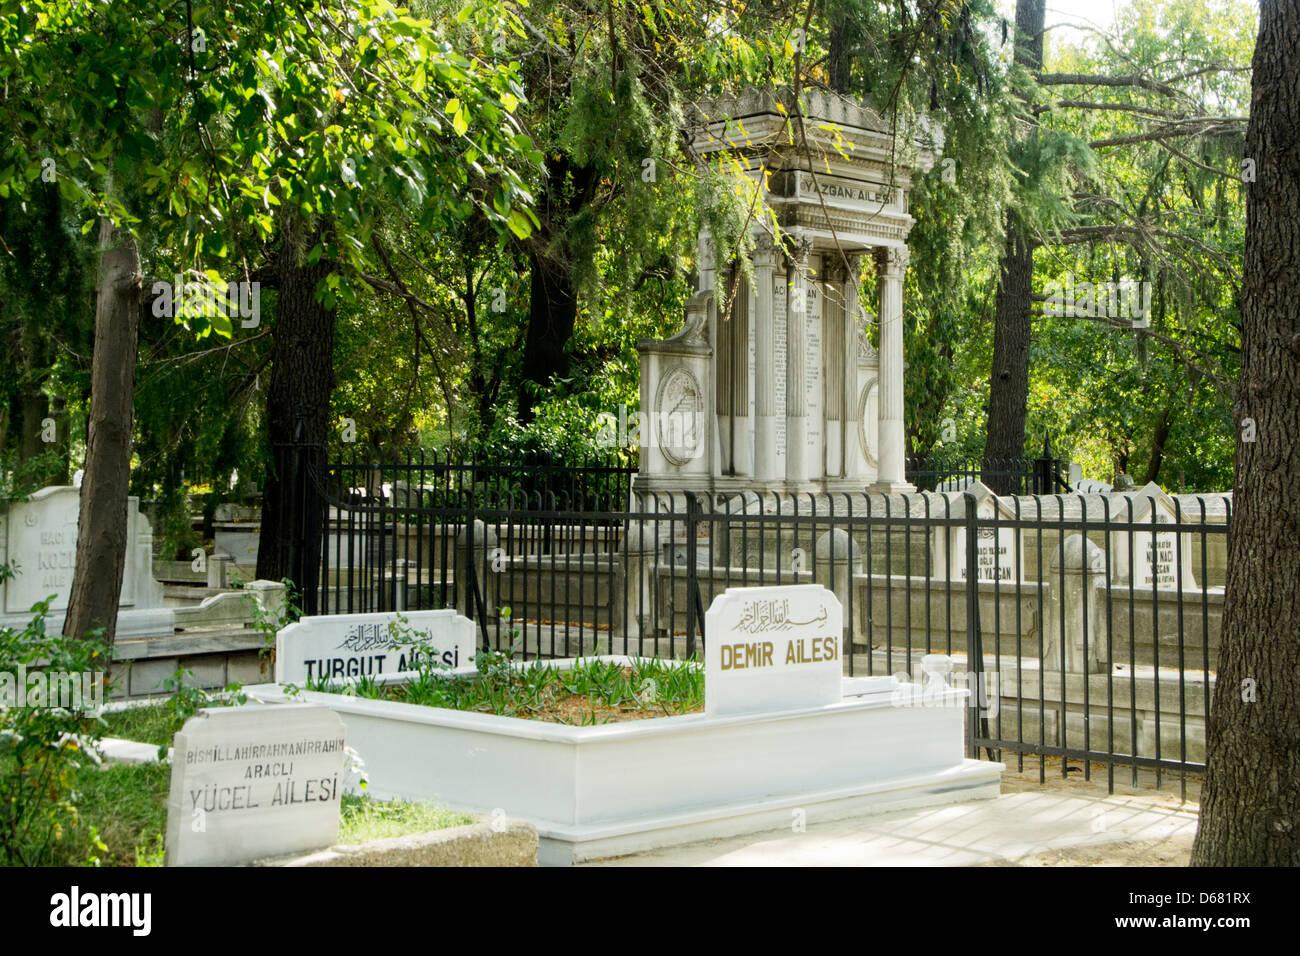 Türkei, Istanbul, Üsküdar, Karaca Ahmet-Friedhof, der grösste Friedhof Istanbuls. Foto Stock